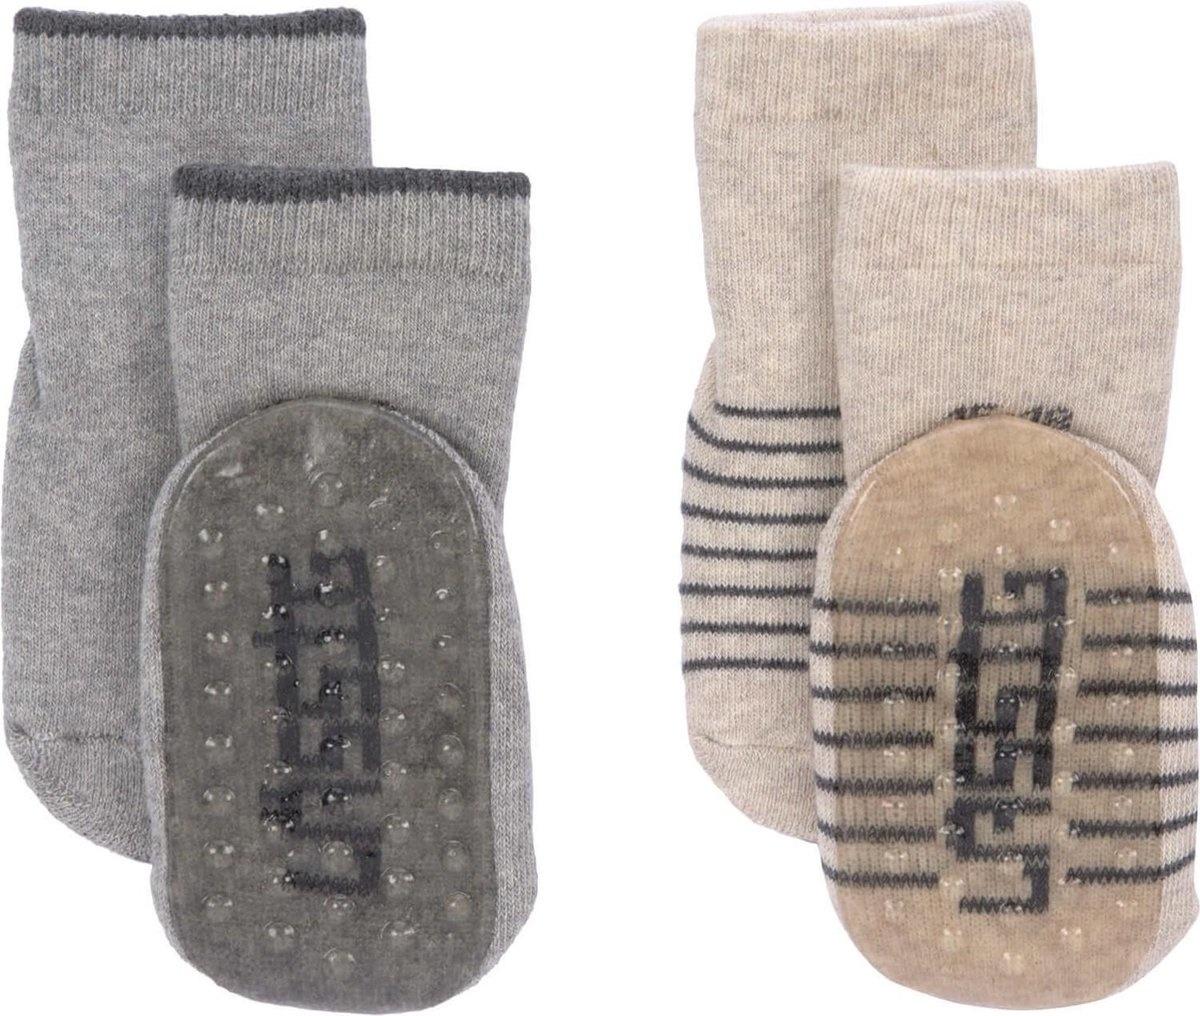 Lässig Anti-slip sokjes 2 paar assorted grey/beige, Maat 27-30